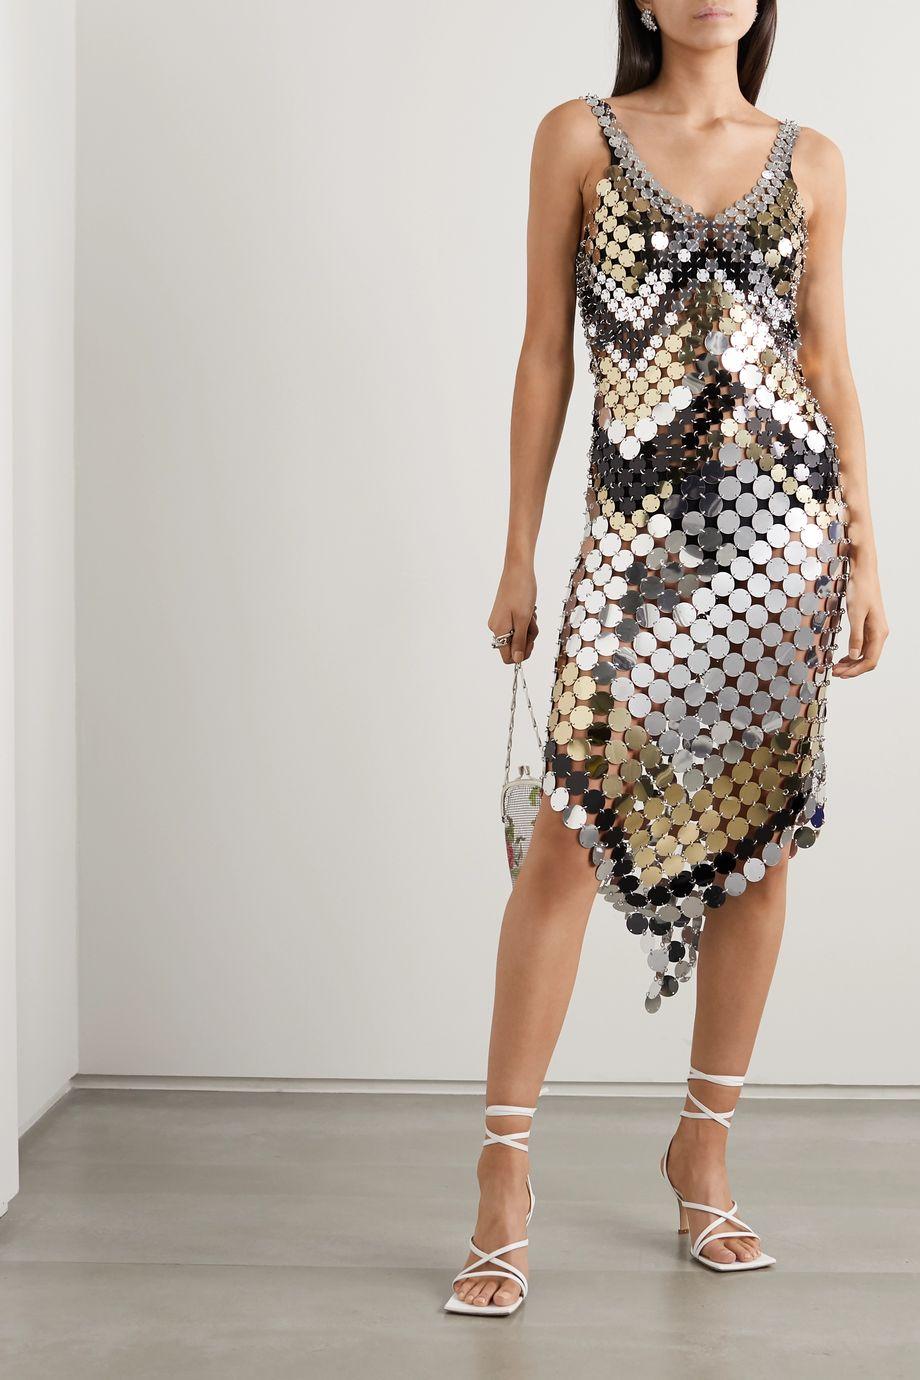 Paco Rabanne Kleid aus Metallic-Mesh